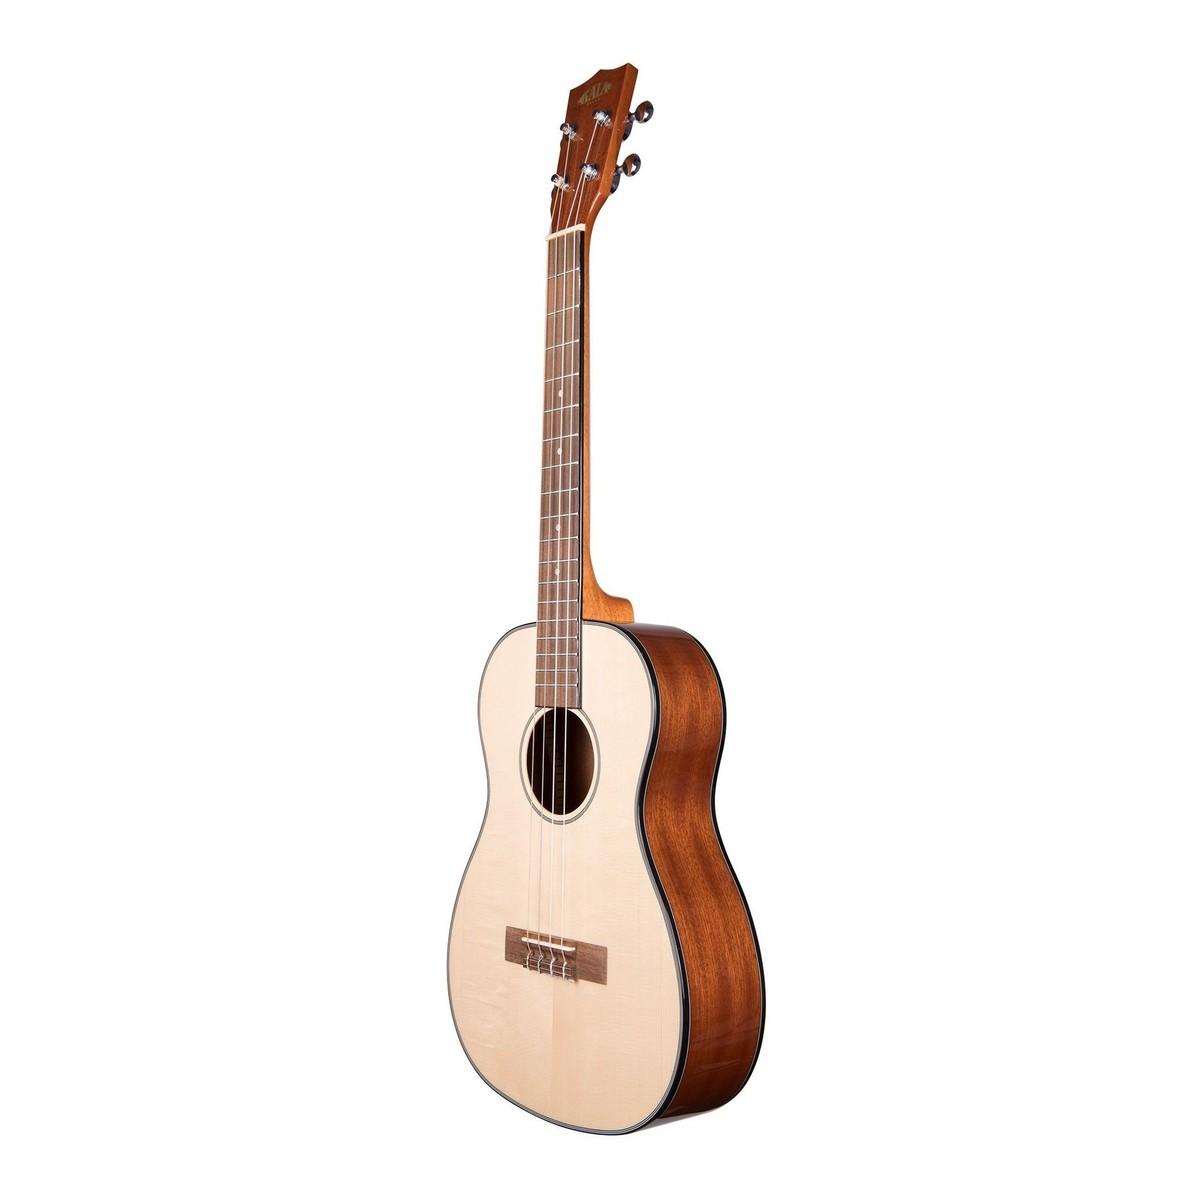 kala ka sb baritone ukulele natural gloss at gear4music. Black Bedroom Furniture Sets. Home Design Ideas